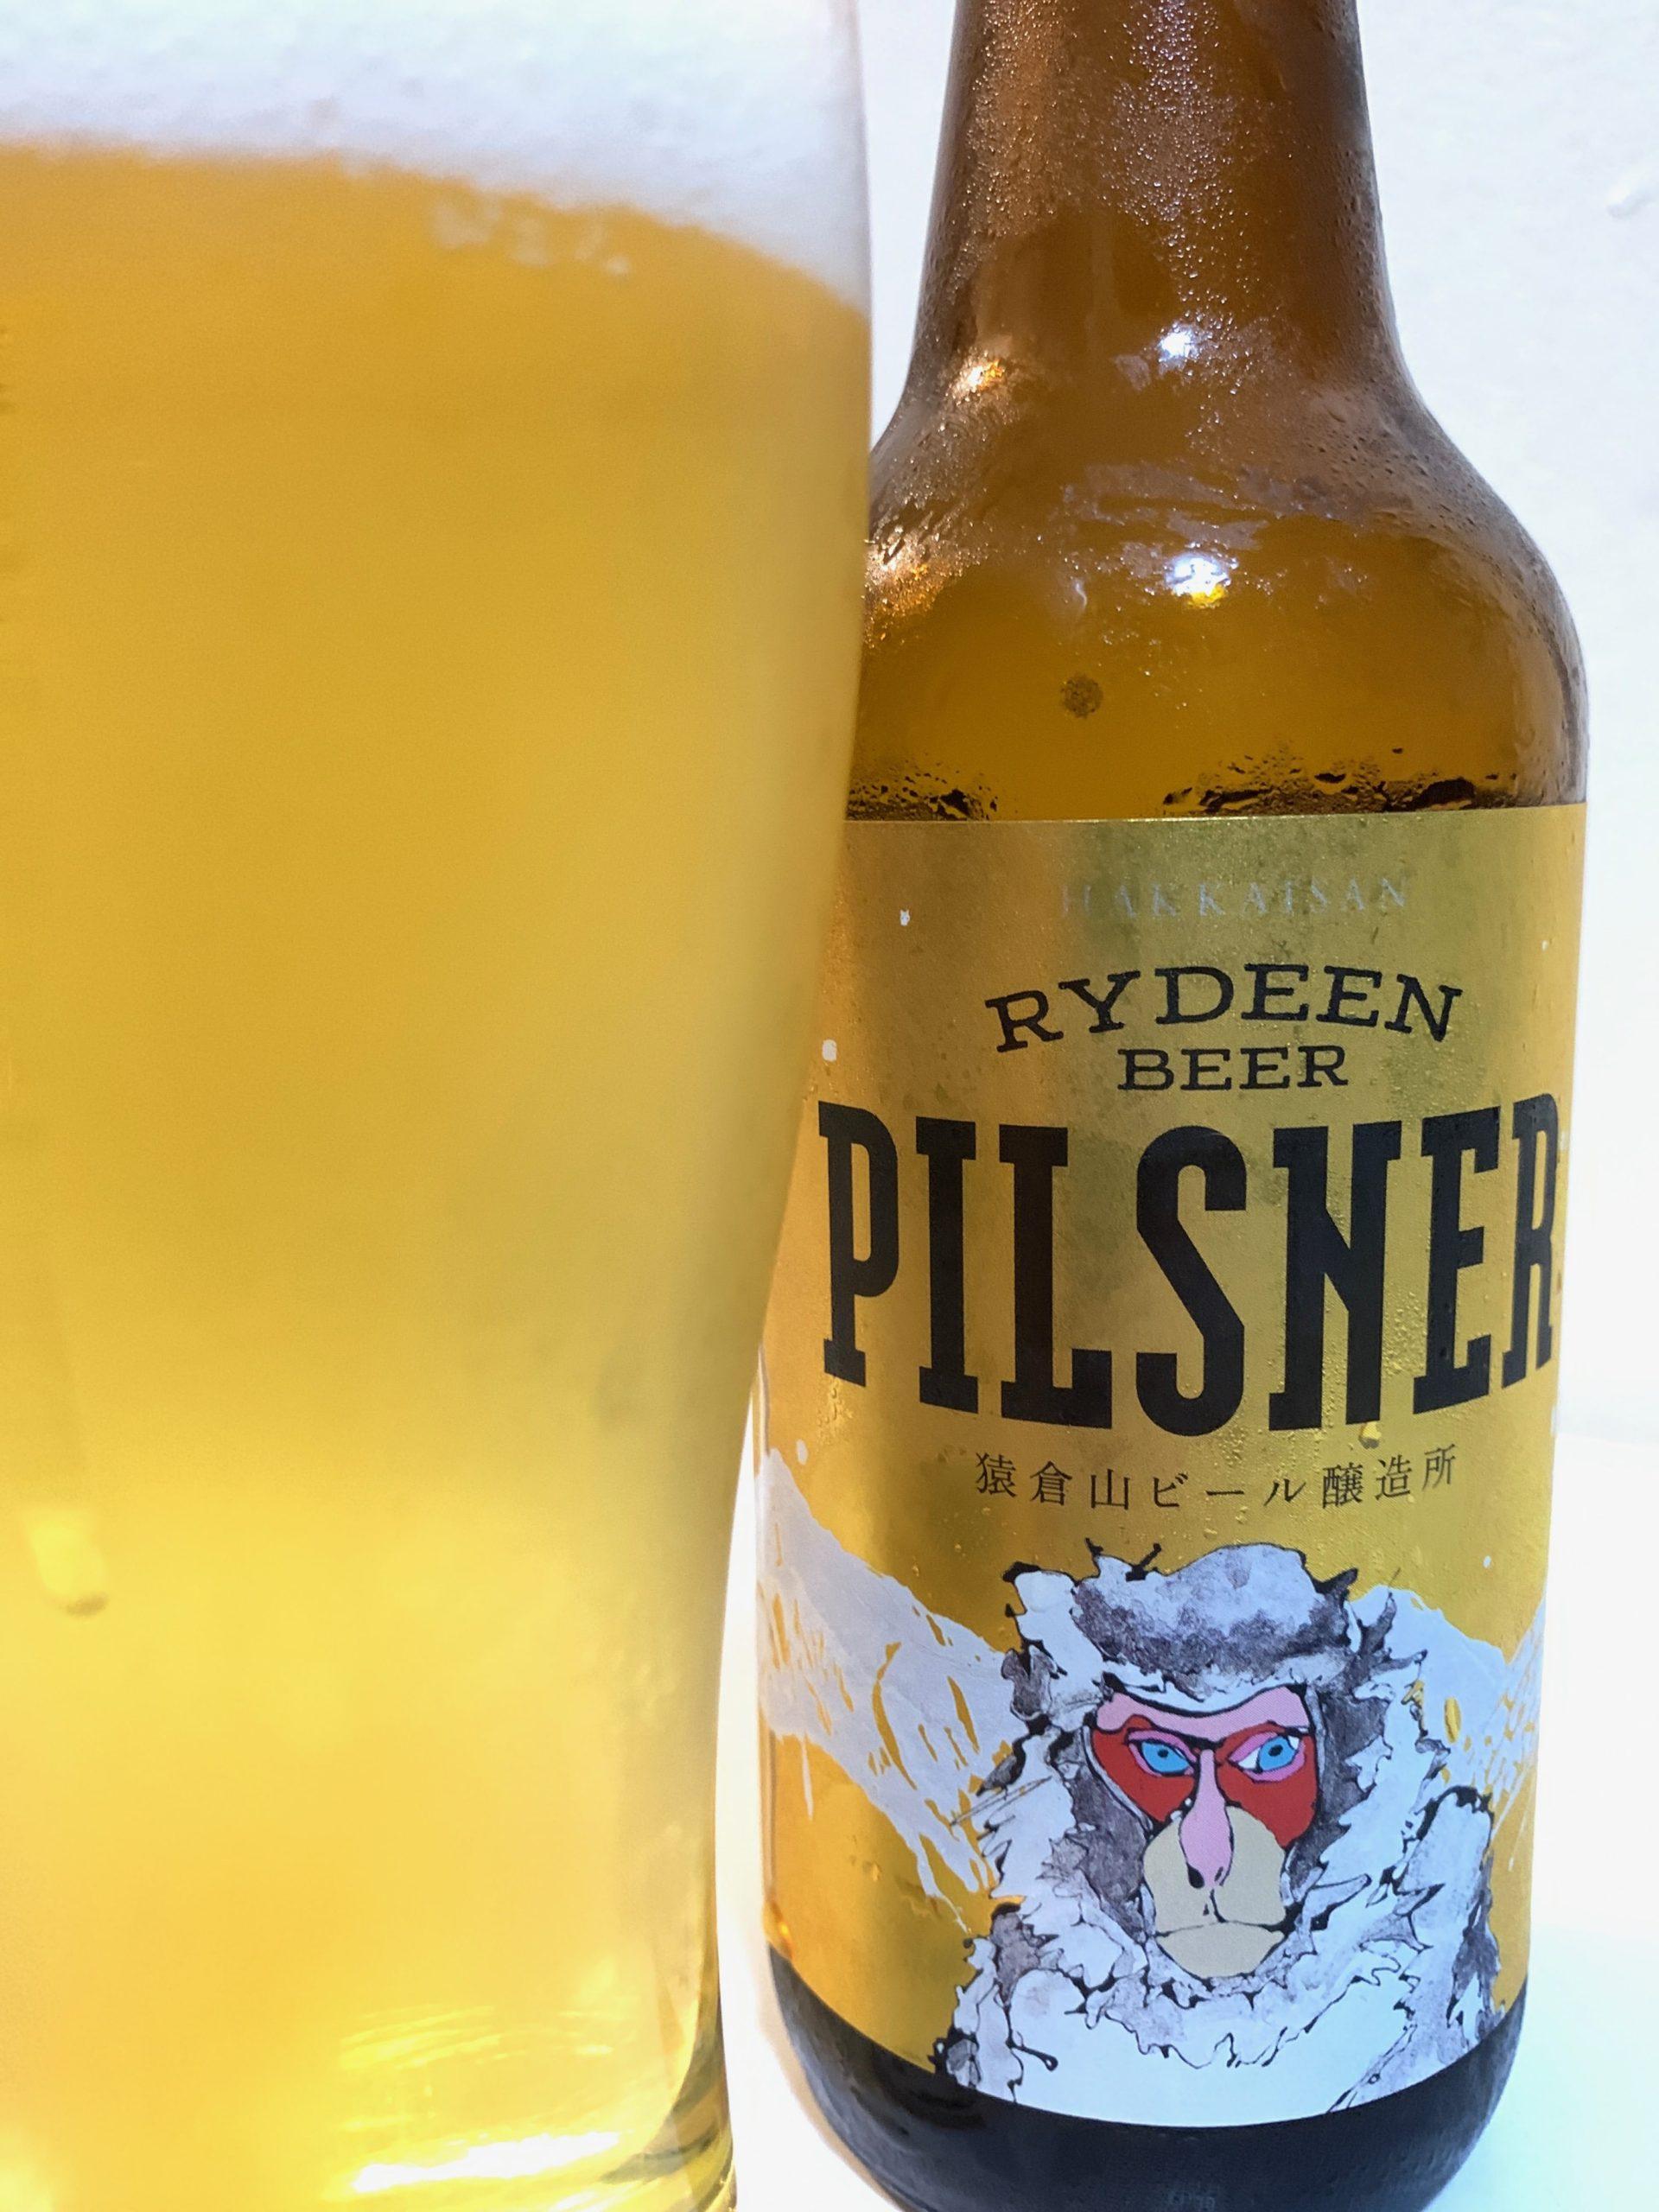 HAKKAISAN RYDEEN BEER PILSNER(ライディーン ビール ピルスナー)